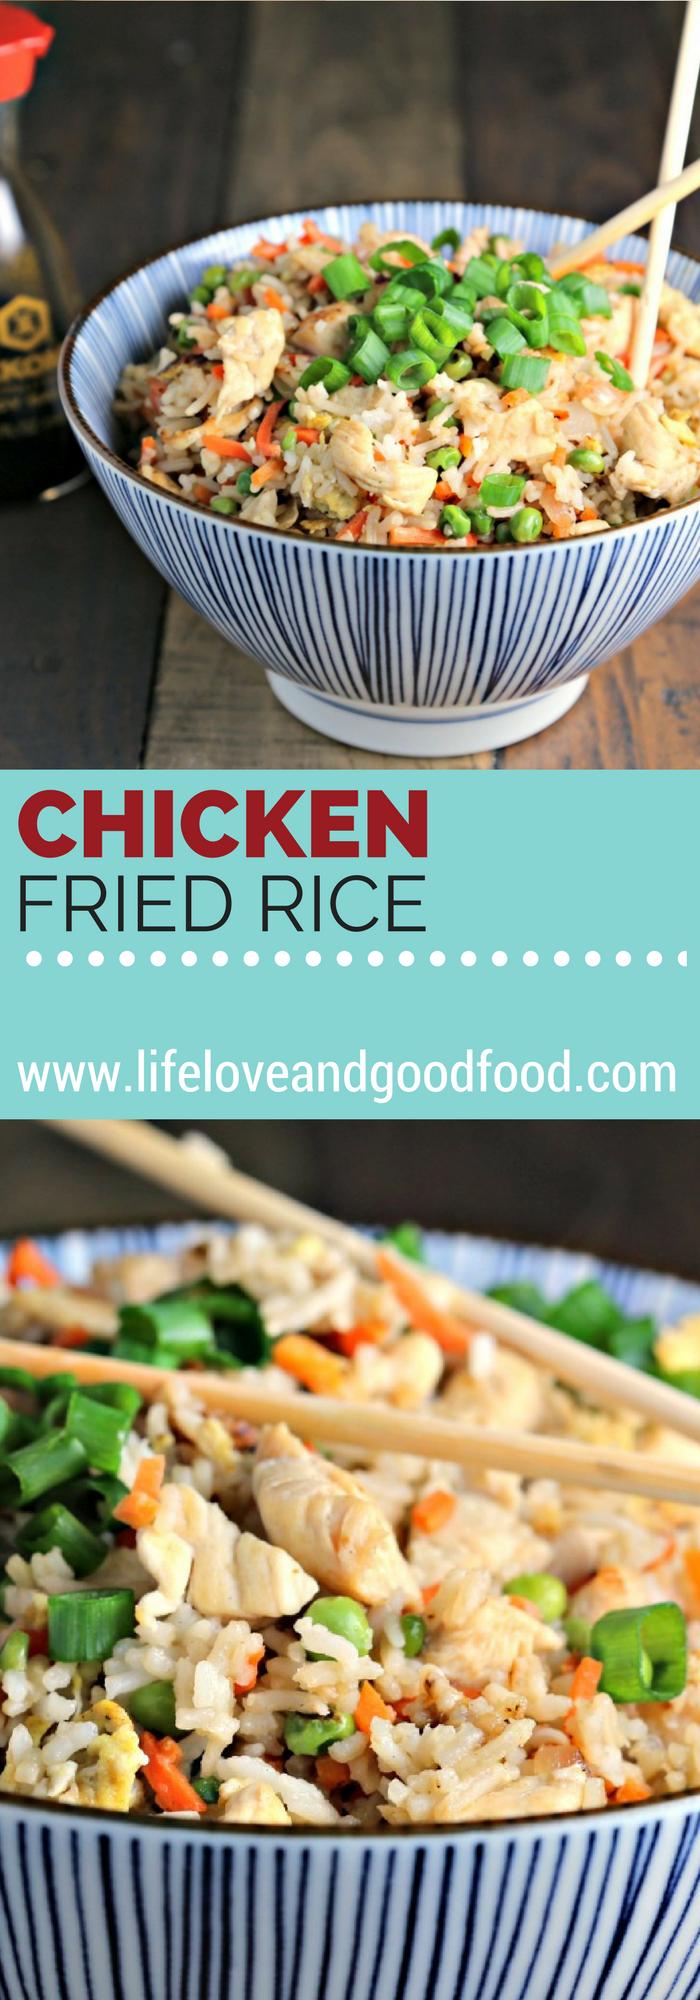 Restaurant style chicken fried rice recipe fried rice rice and chicken fried rice life love and good food recipe dinner forumfinder Gallery